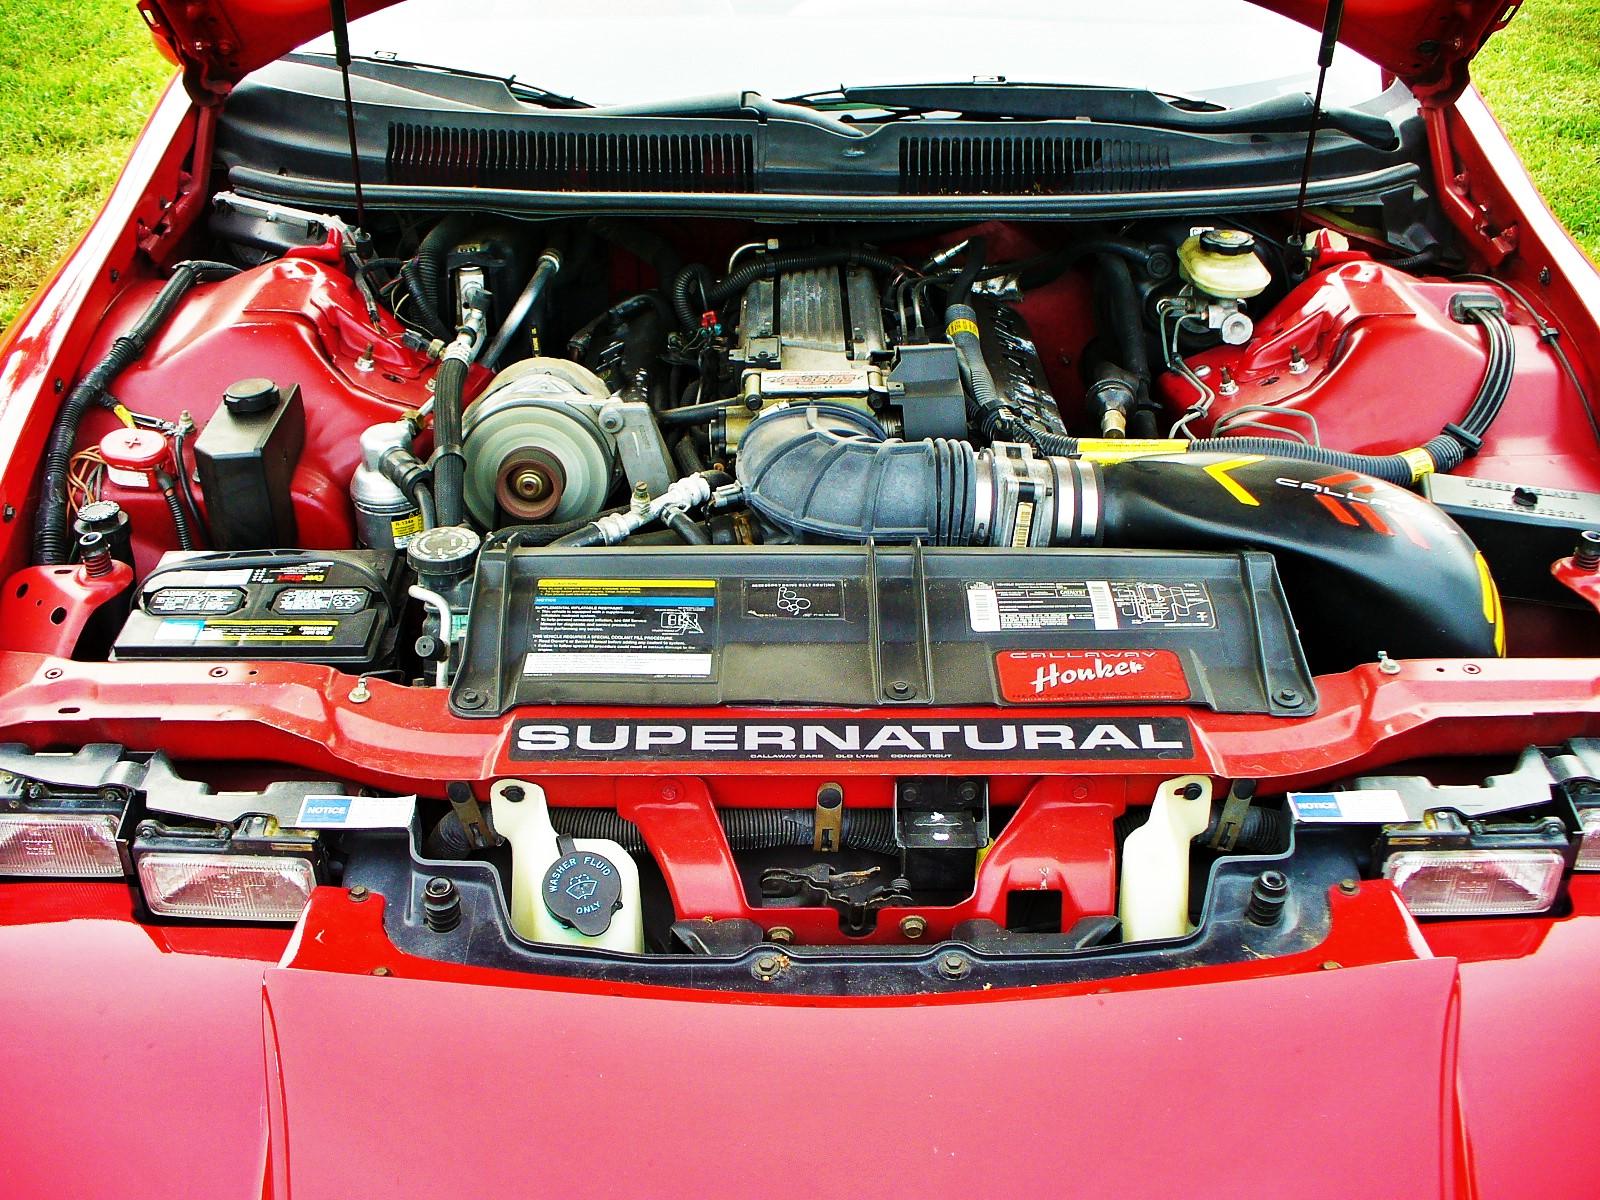 Calloway C8 engine detail